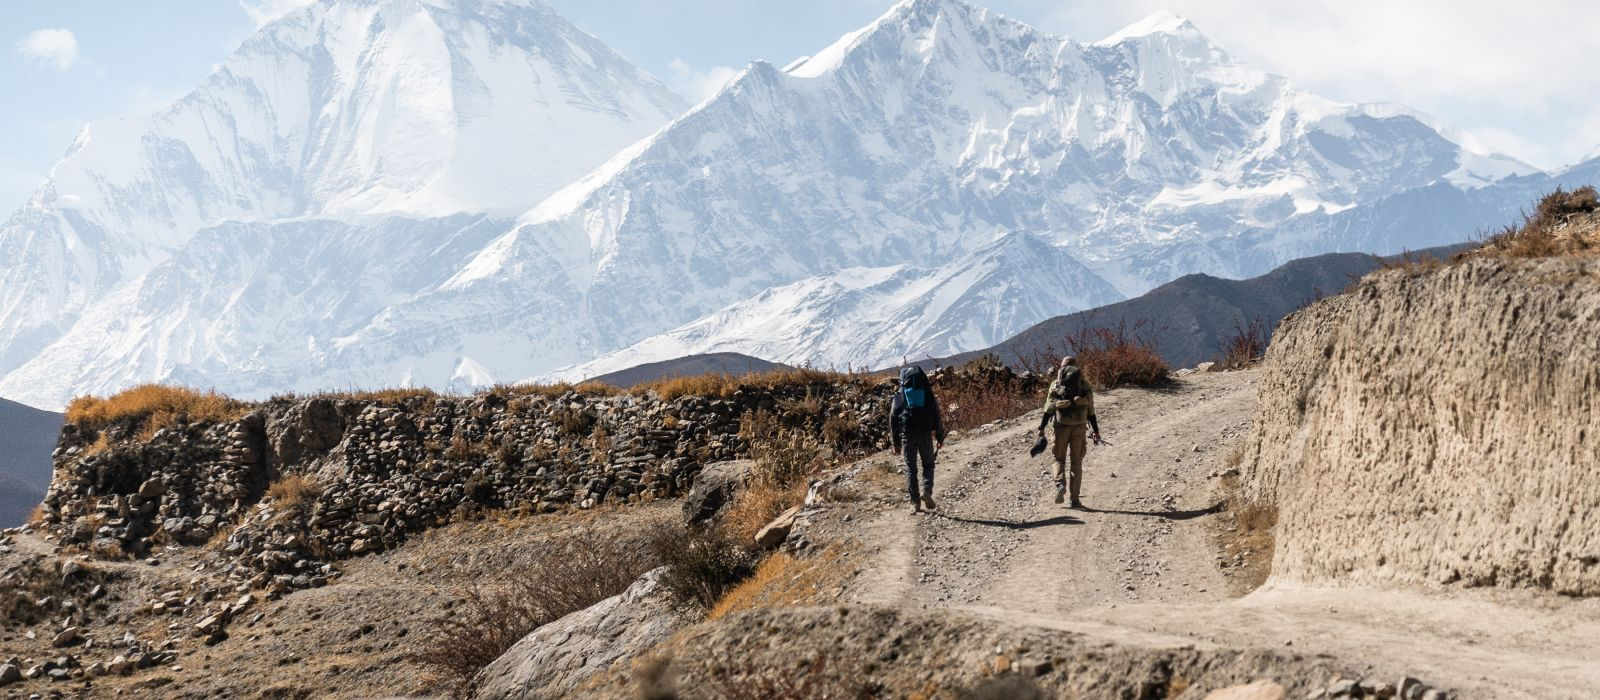 Nepal Mountains Himalaya Trekking Annapurna Sanctuary, Asia